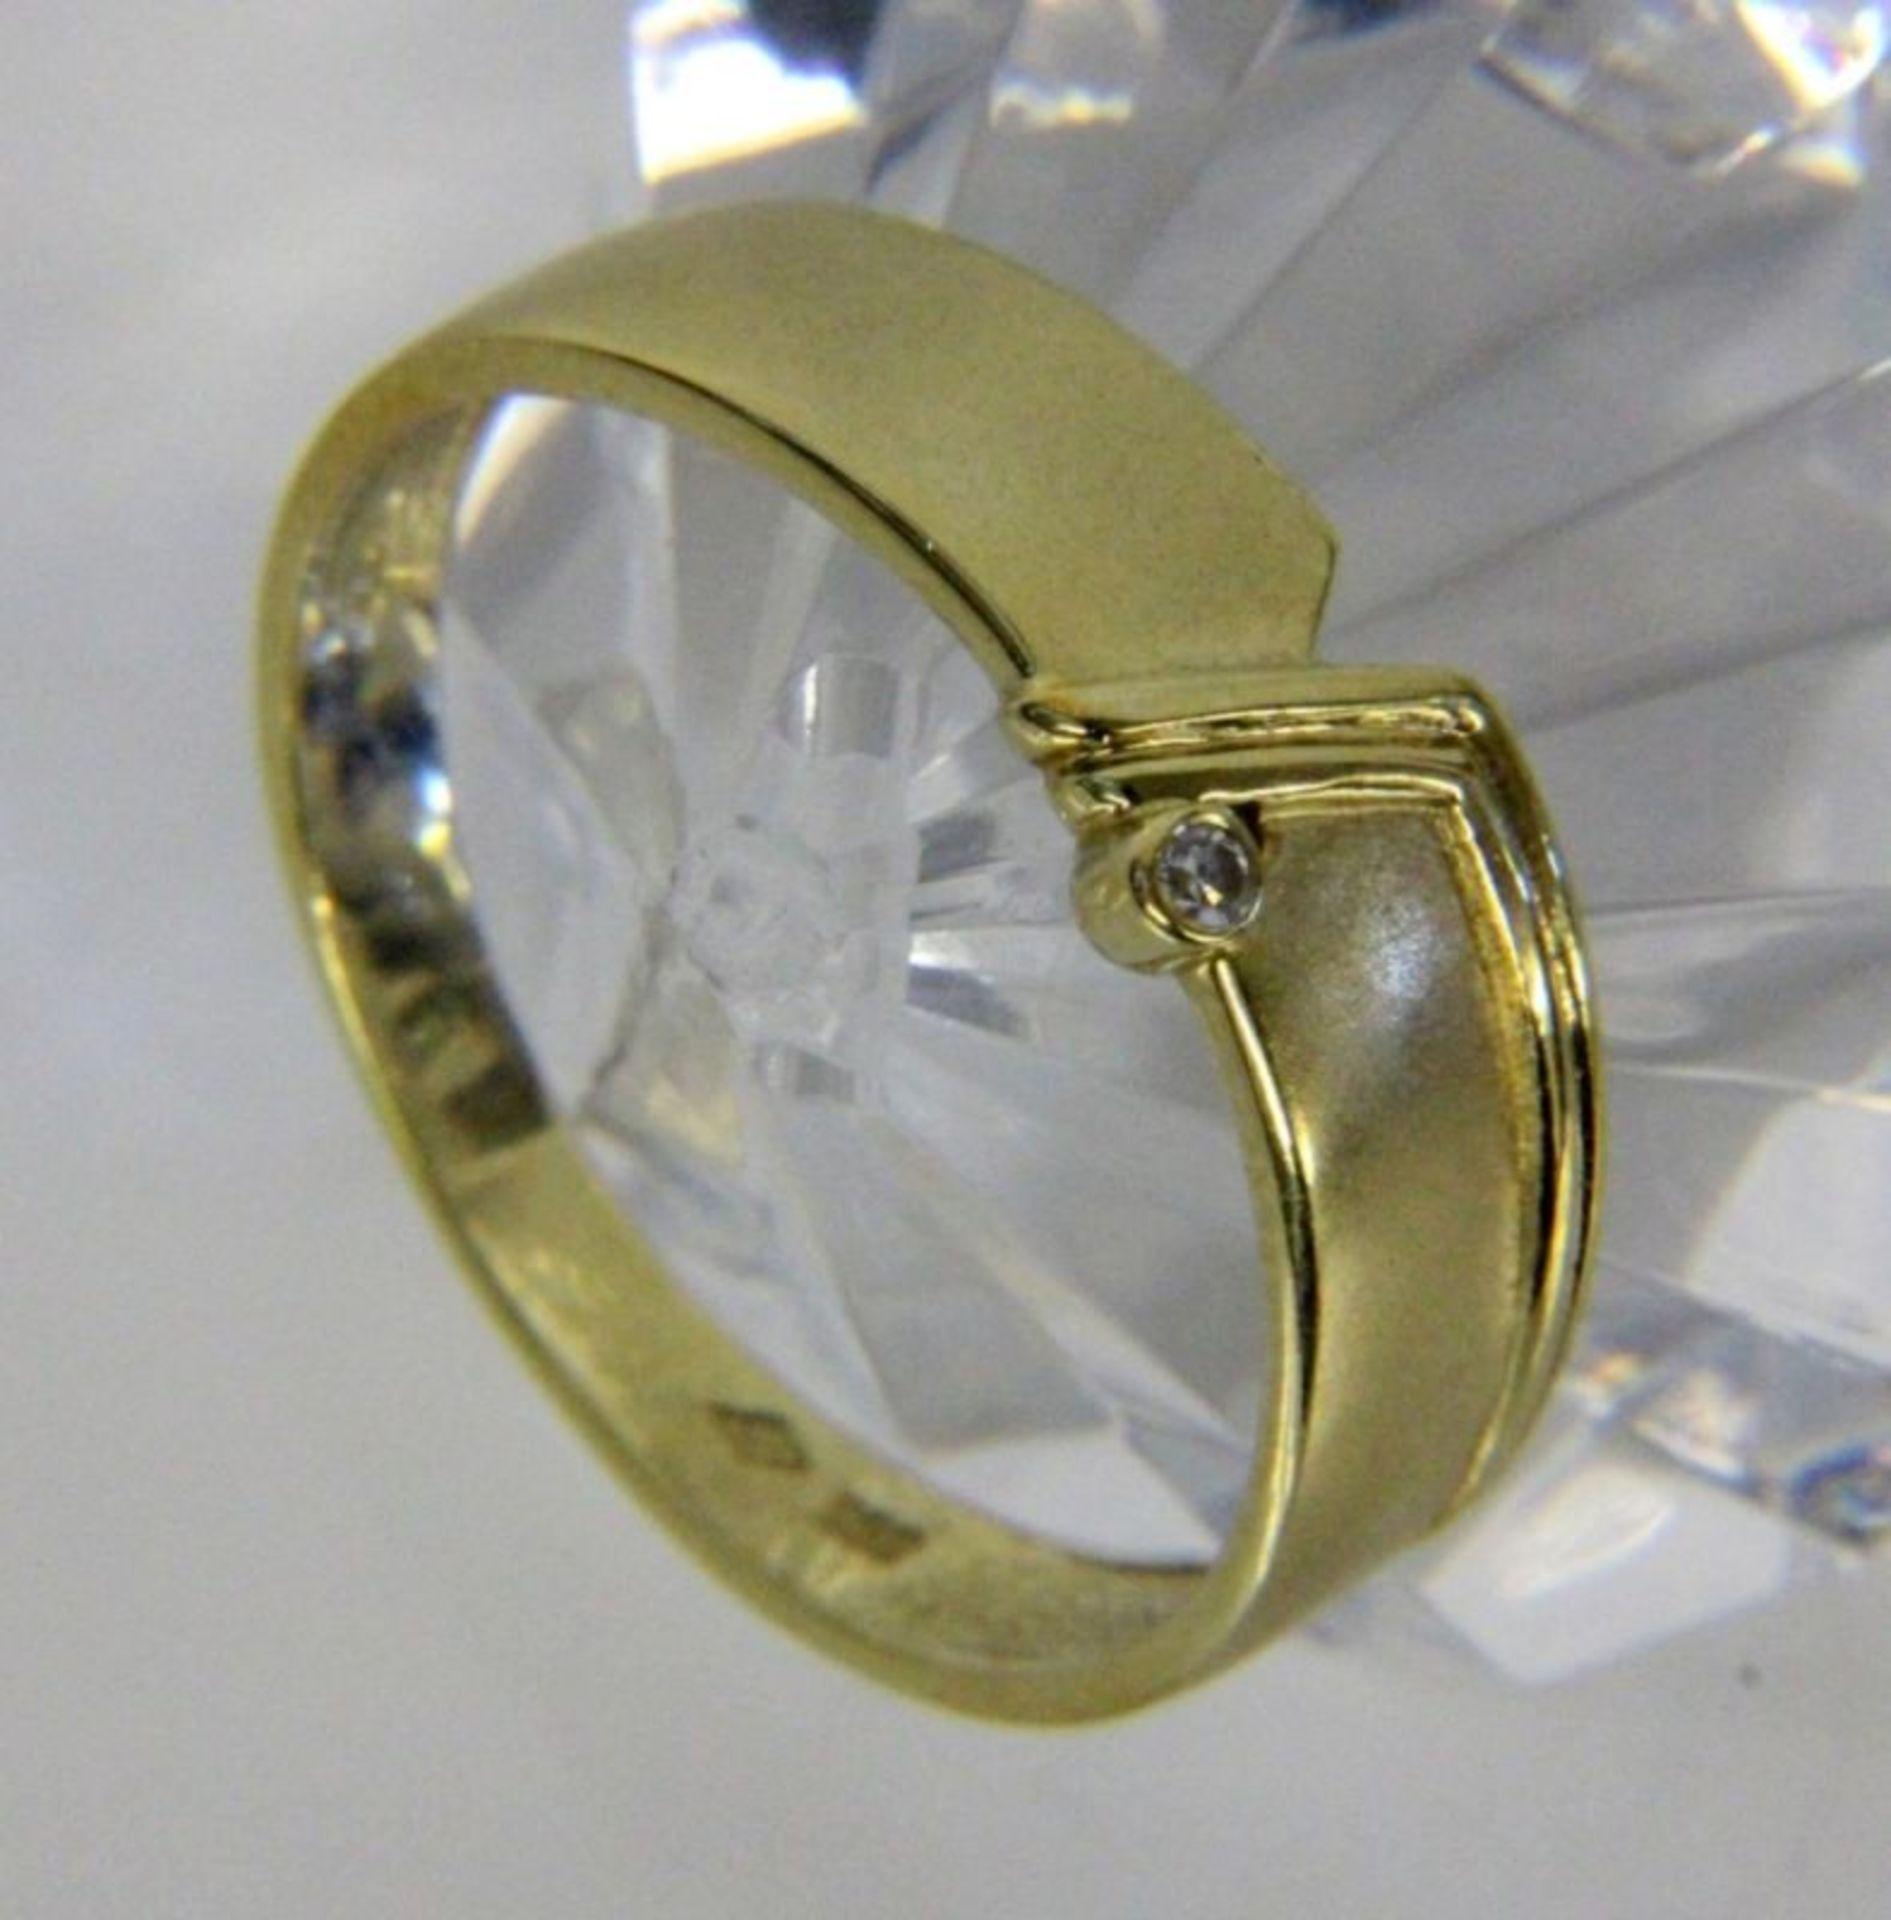 DAMENRING585/000 Gelbgold mit kleinem Brillant. Ringgr. 56, Brutto ca. 4,1gA LADIES RING 585/000